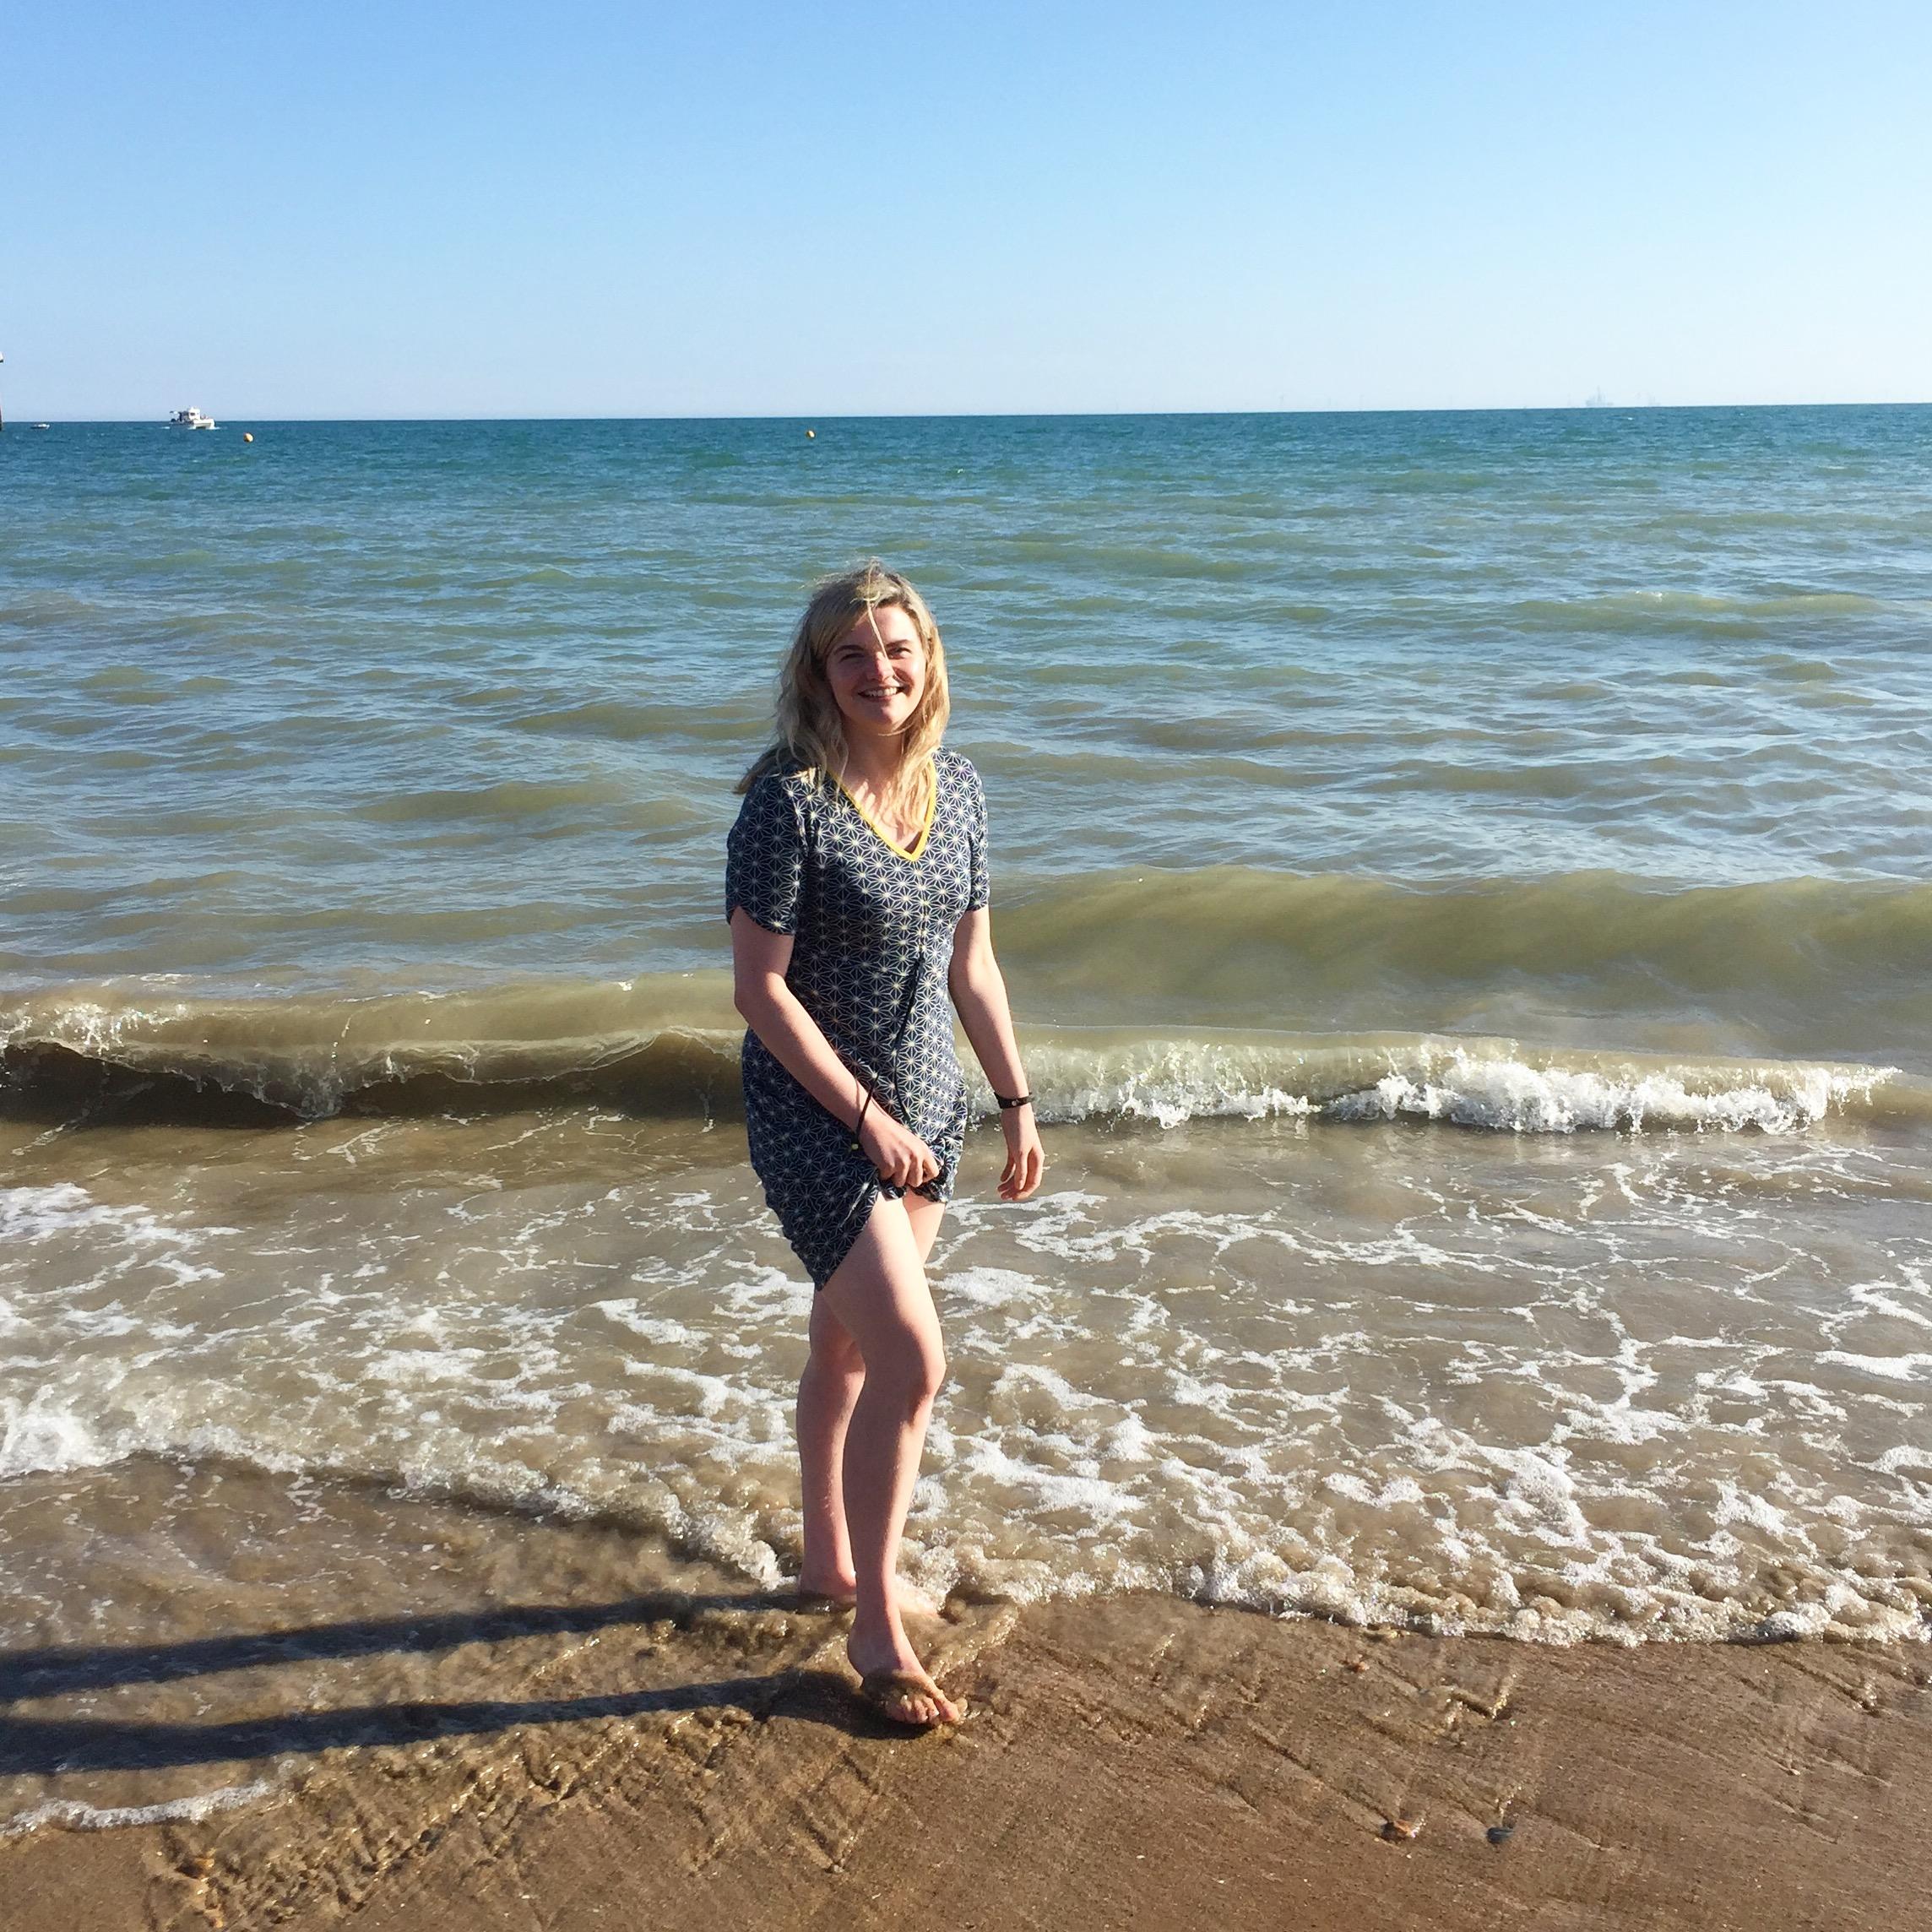 Paddling in the sea at Brighton